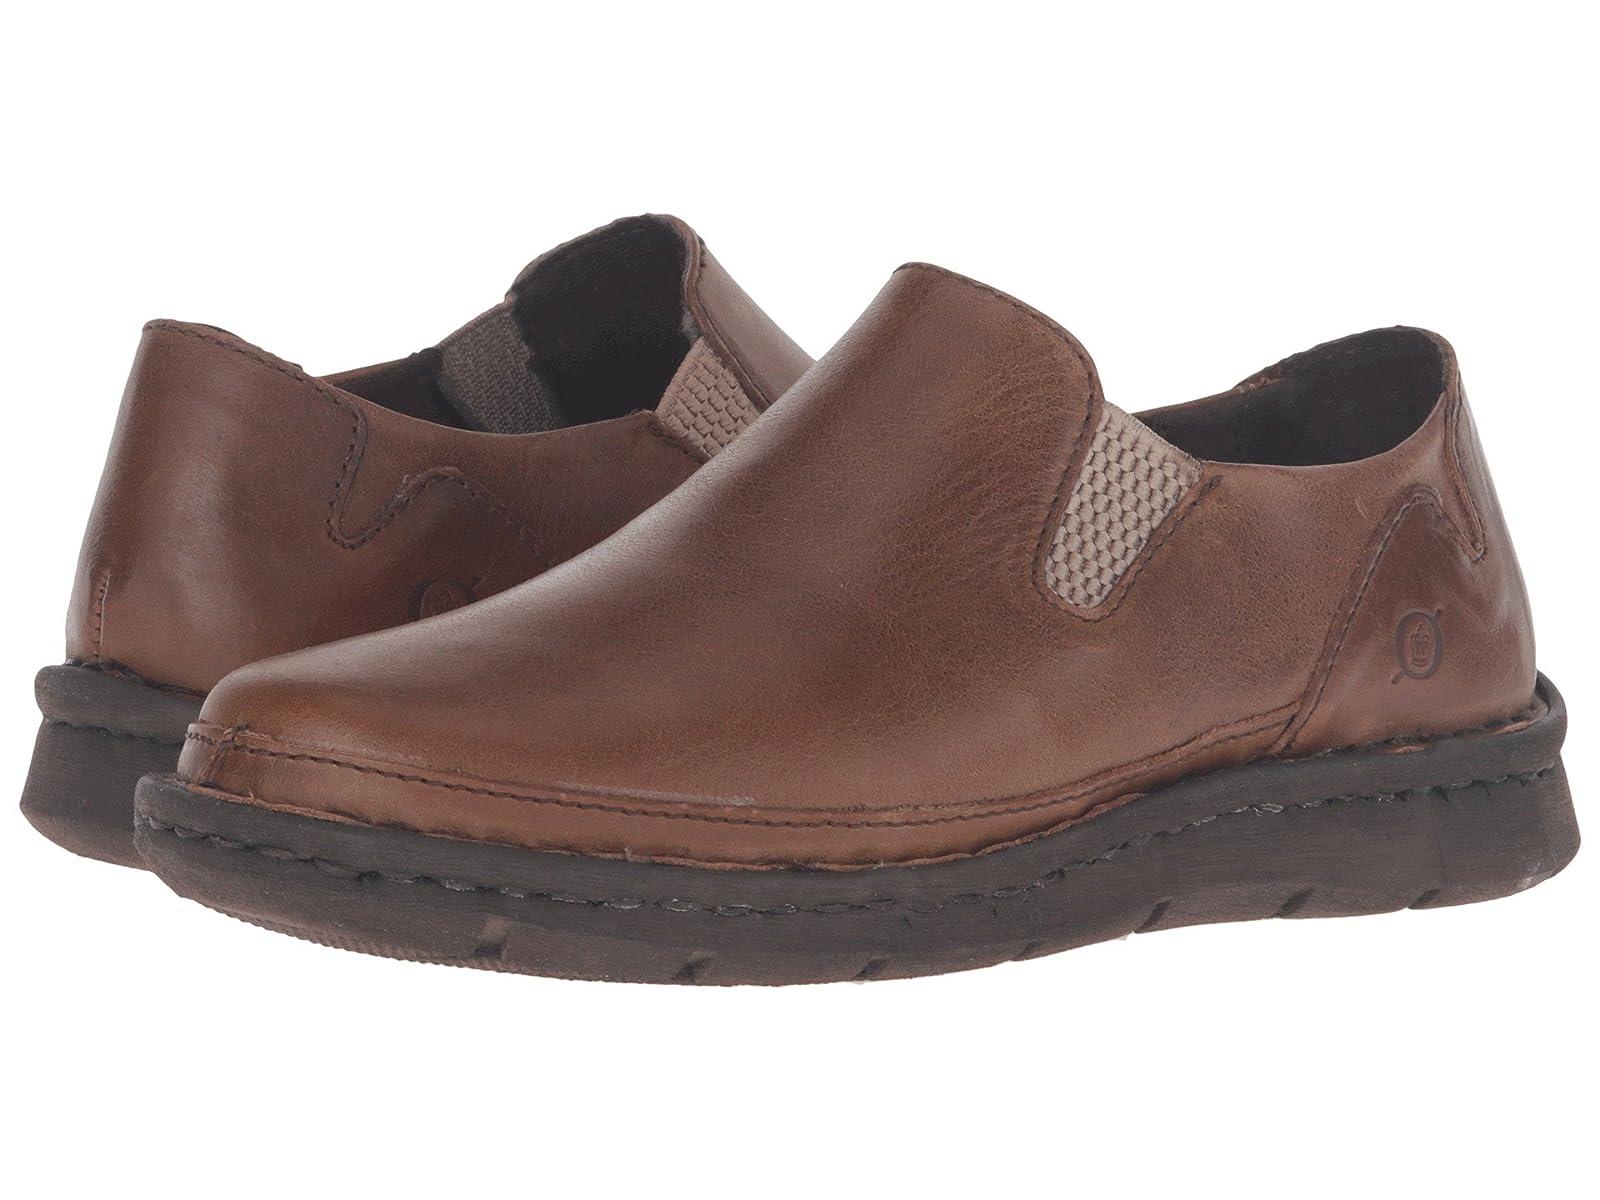 Born AzumaCheap and distinctive eye-catching shoes